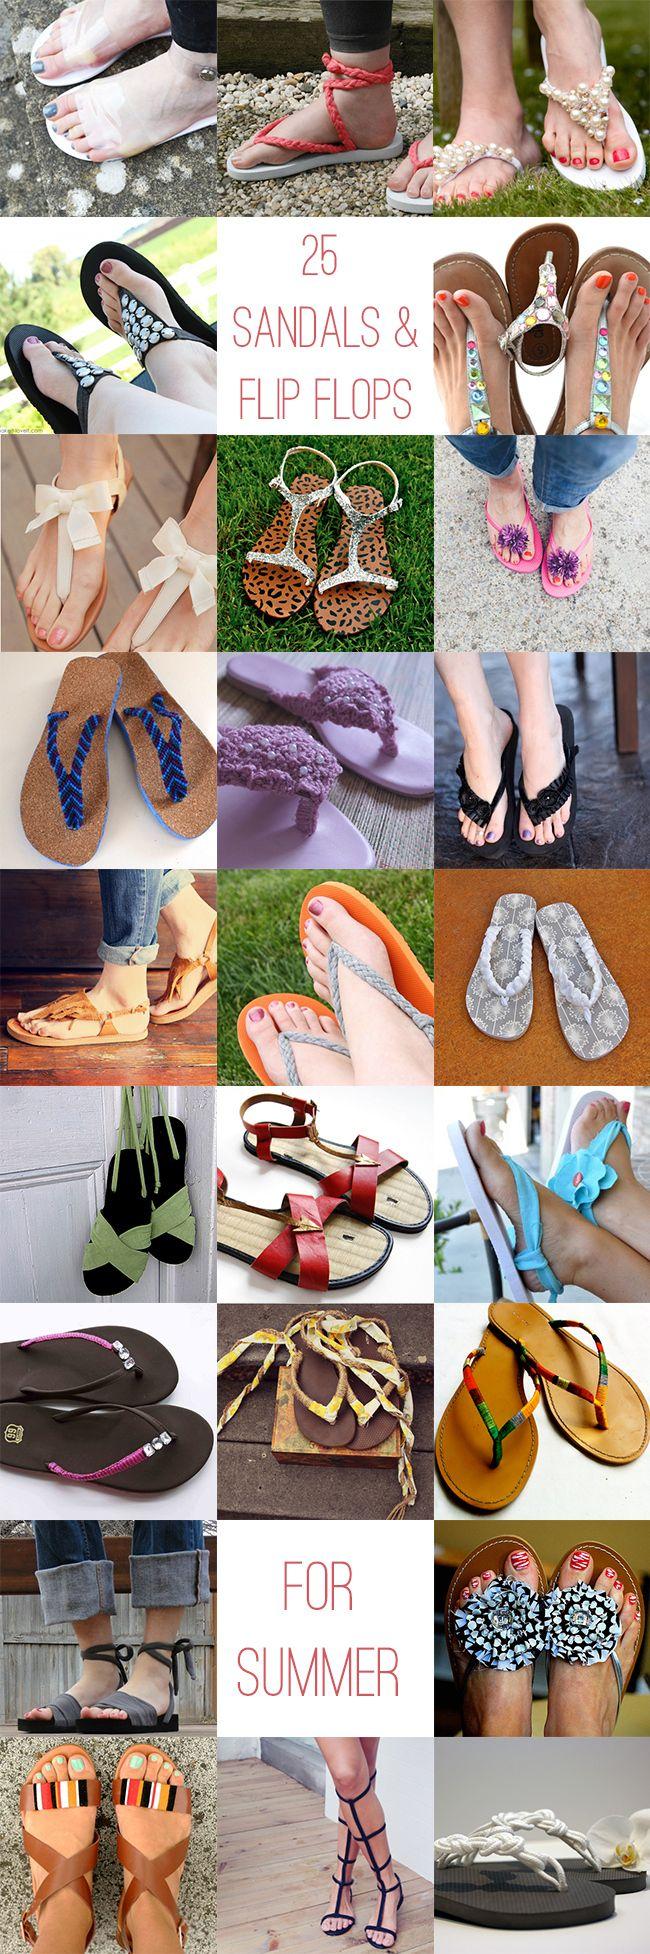 sandals.jpg 650×1,954 pixeles